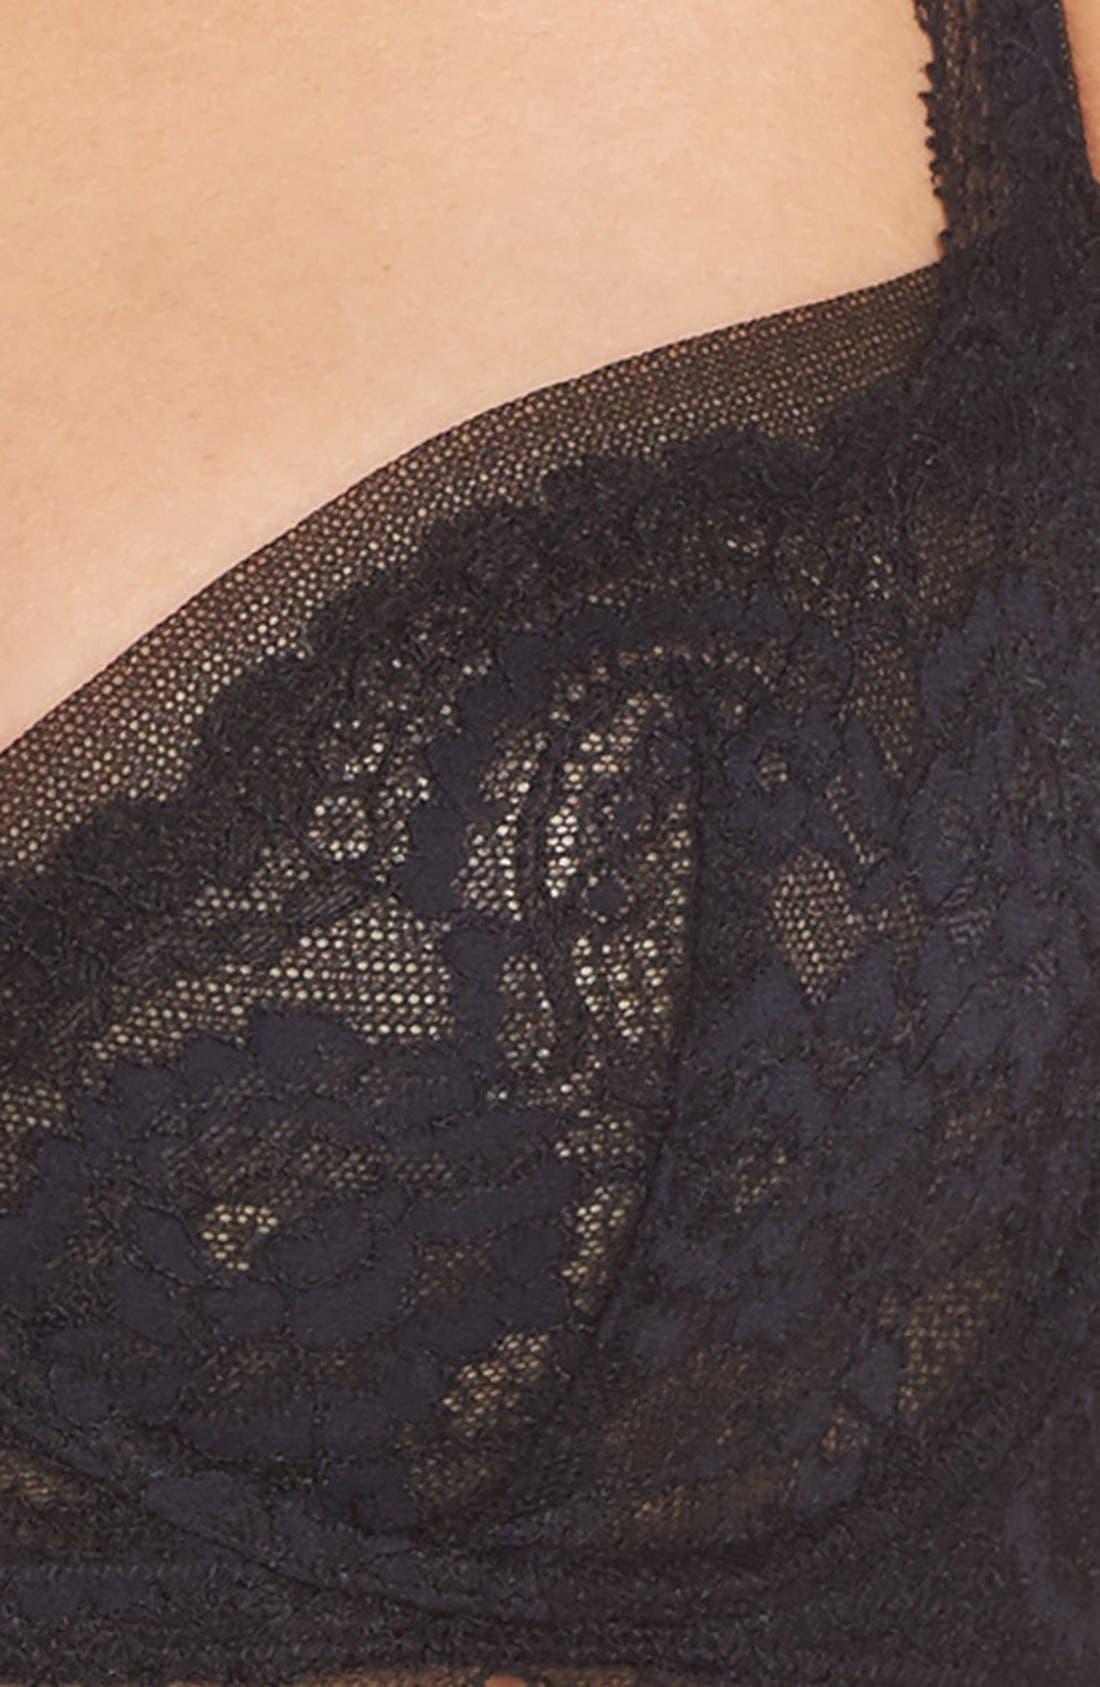 'Minx' Unlined Lace Demi Underwire Bra,                             Alternate thumbnail 21, color,